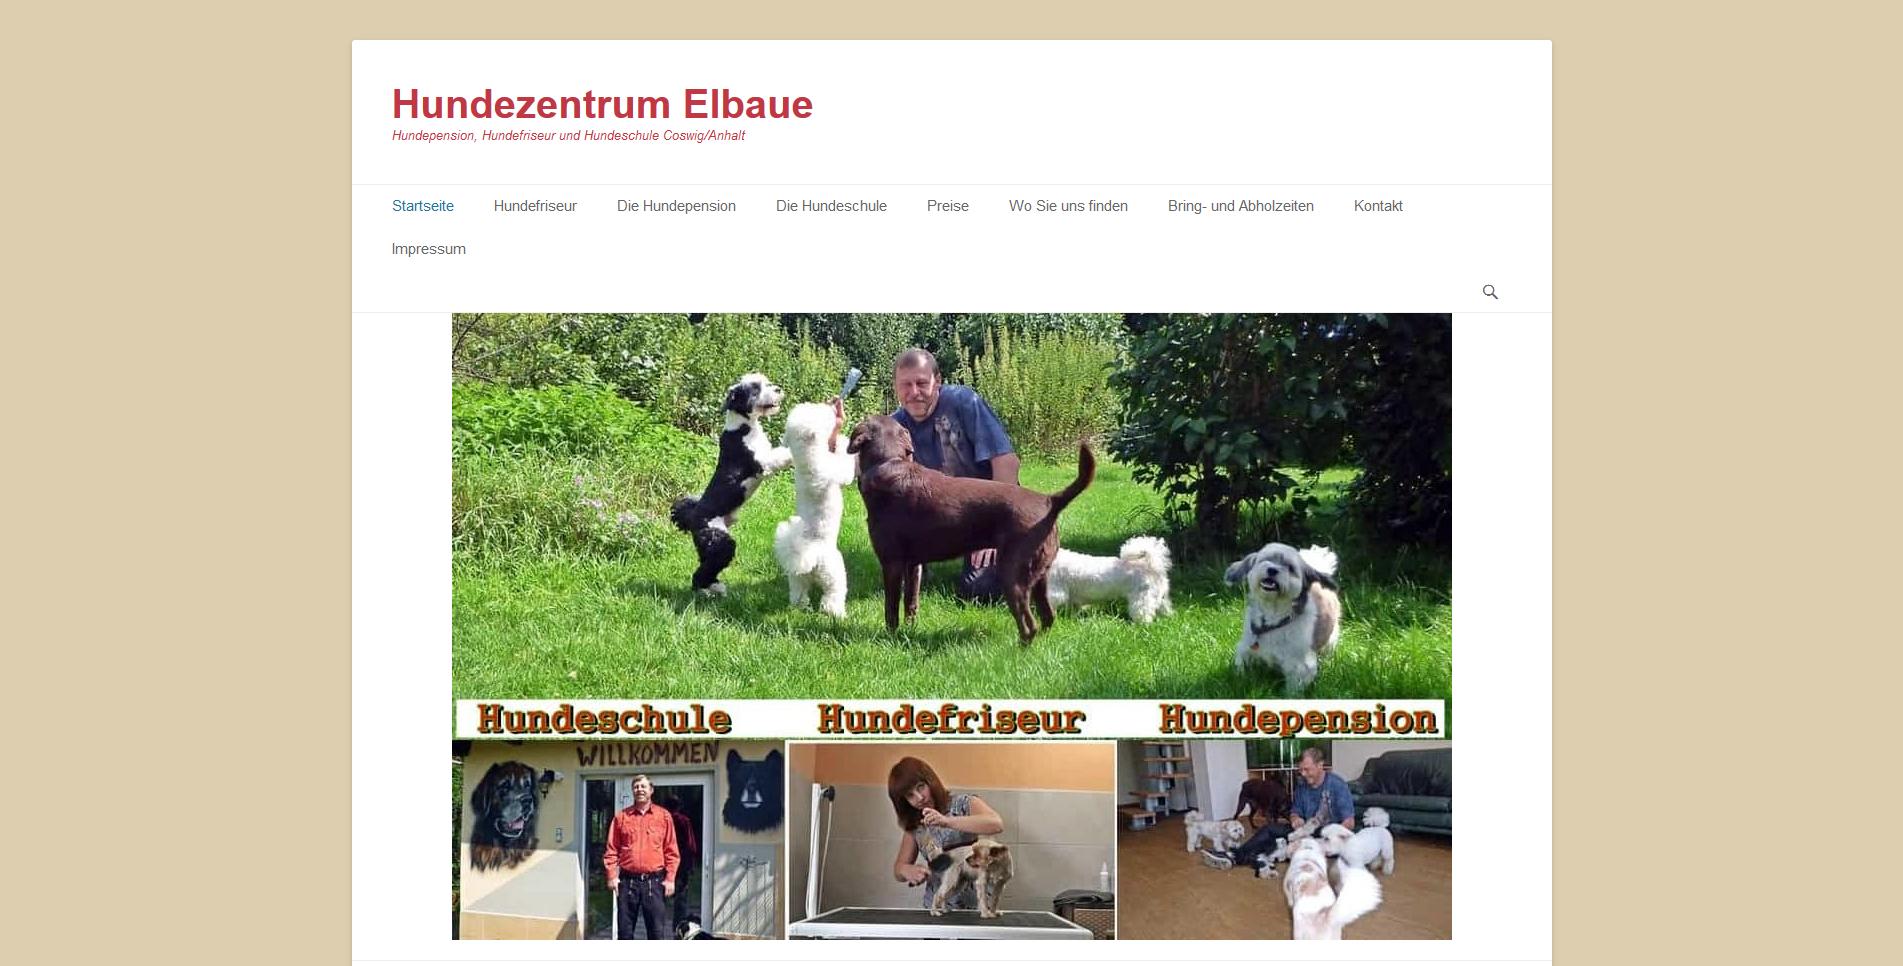 Hundezentrum Elbaue